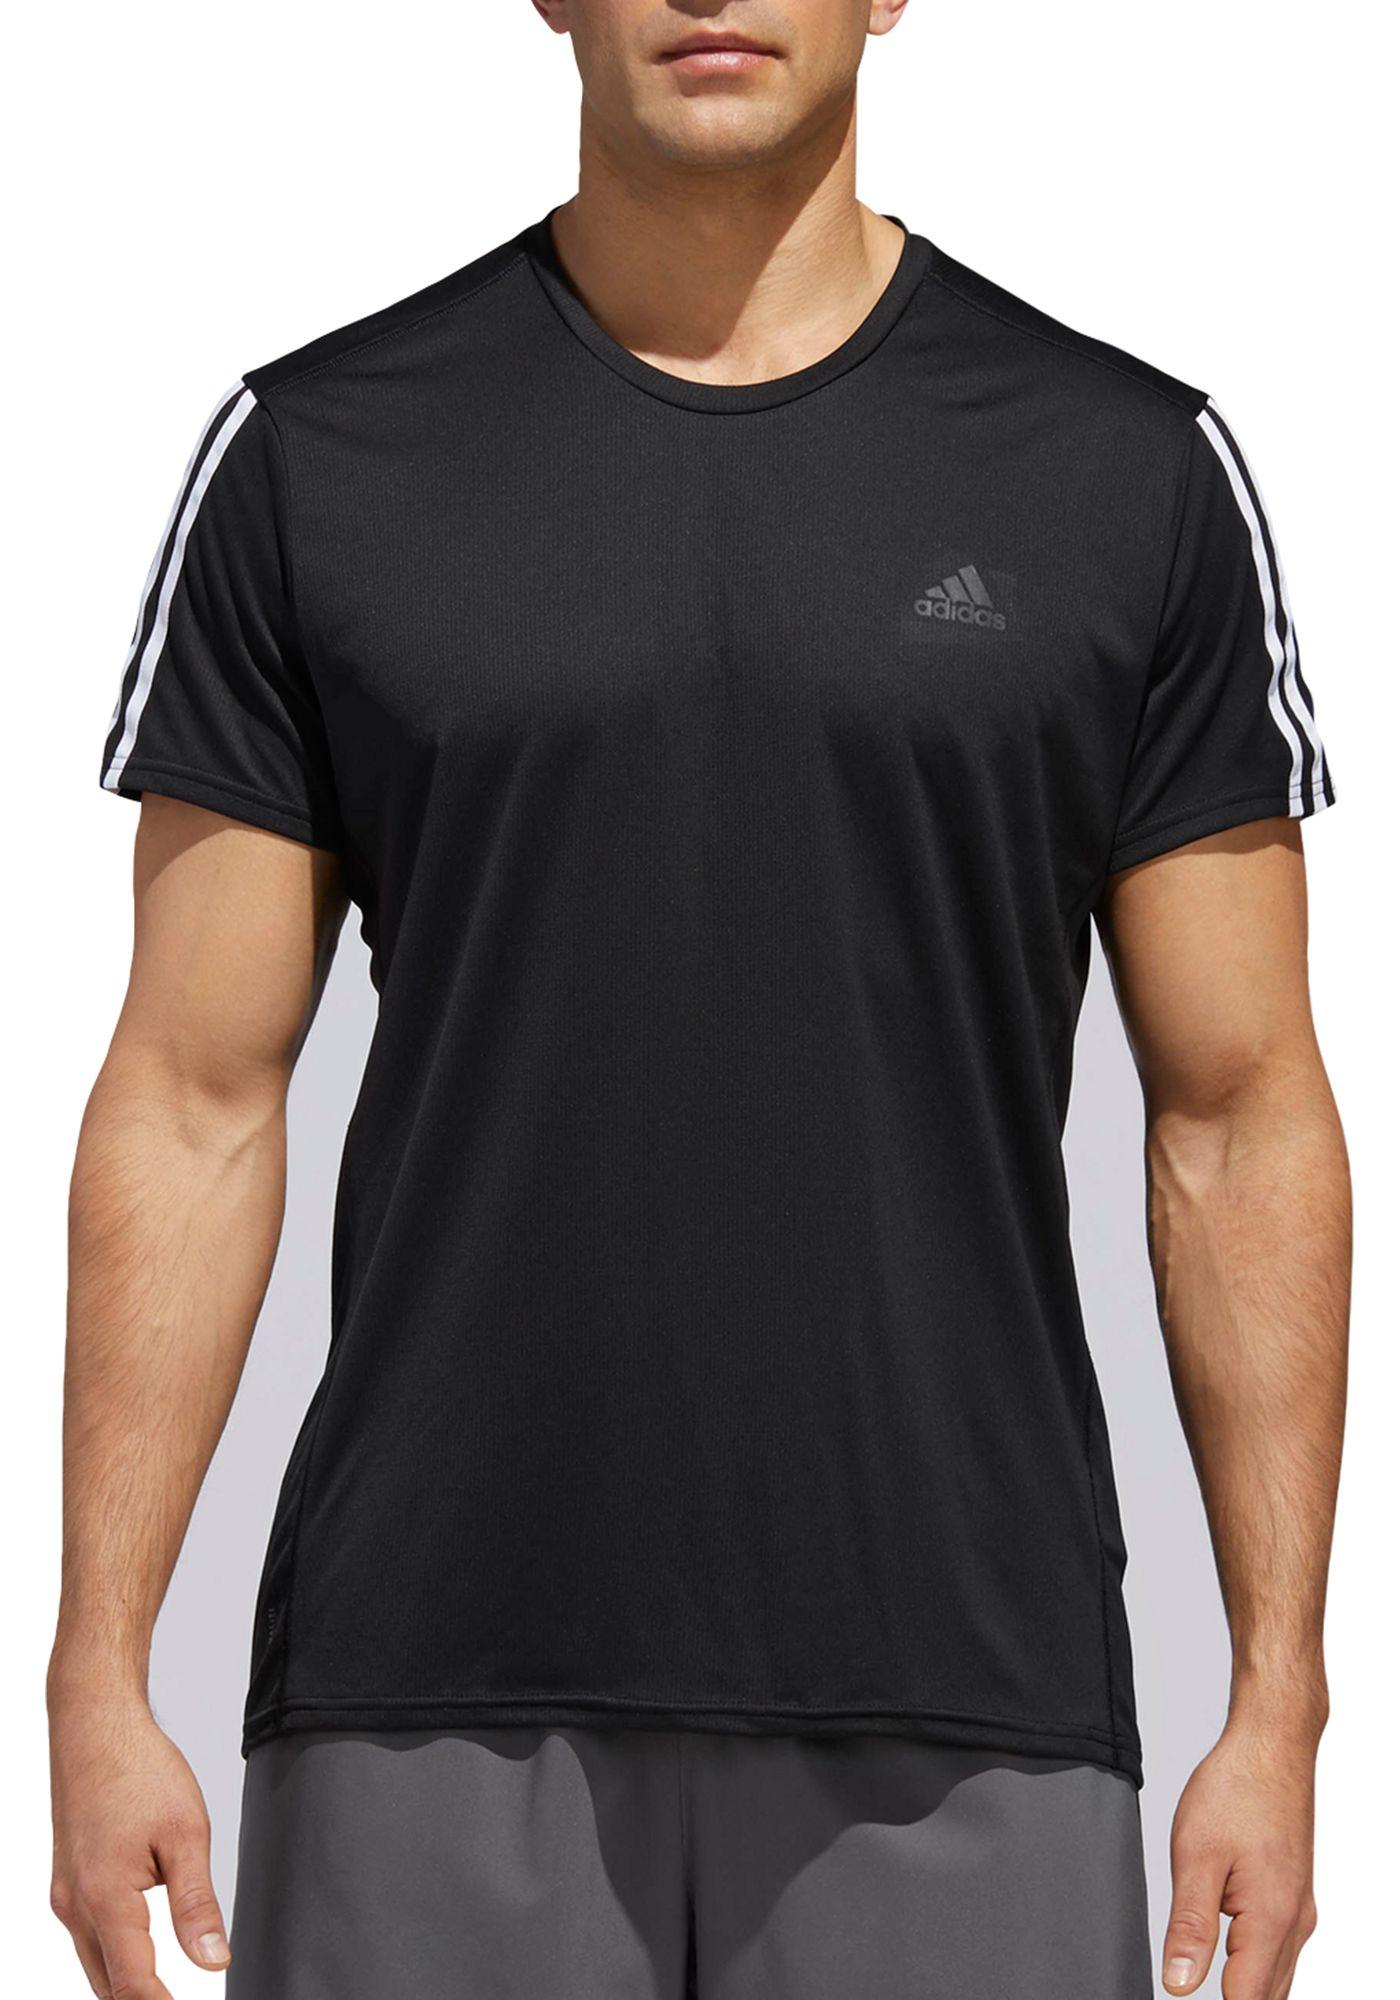 adidas Men's 3-Stripes Running T-Shirt